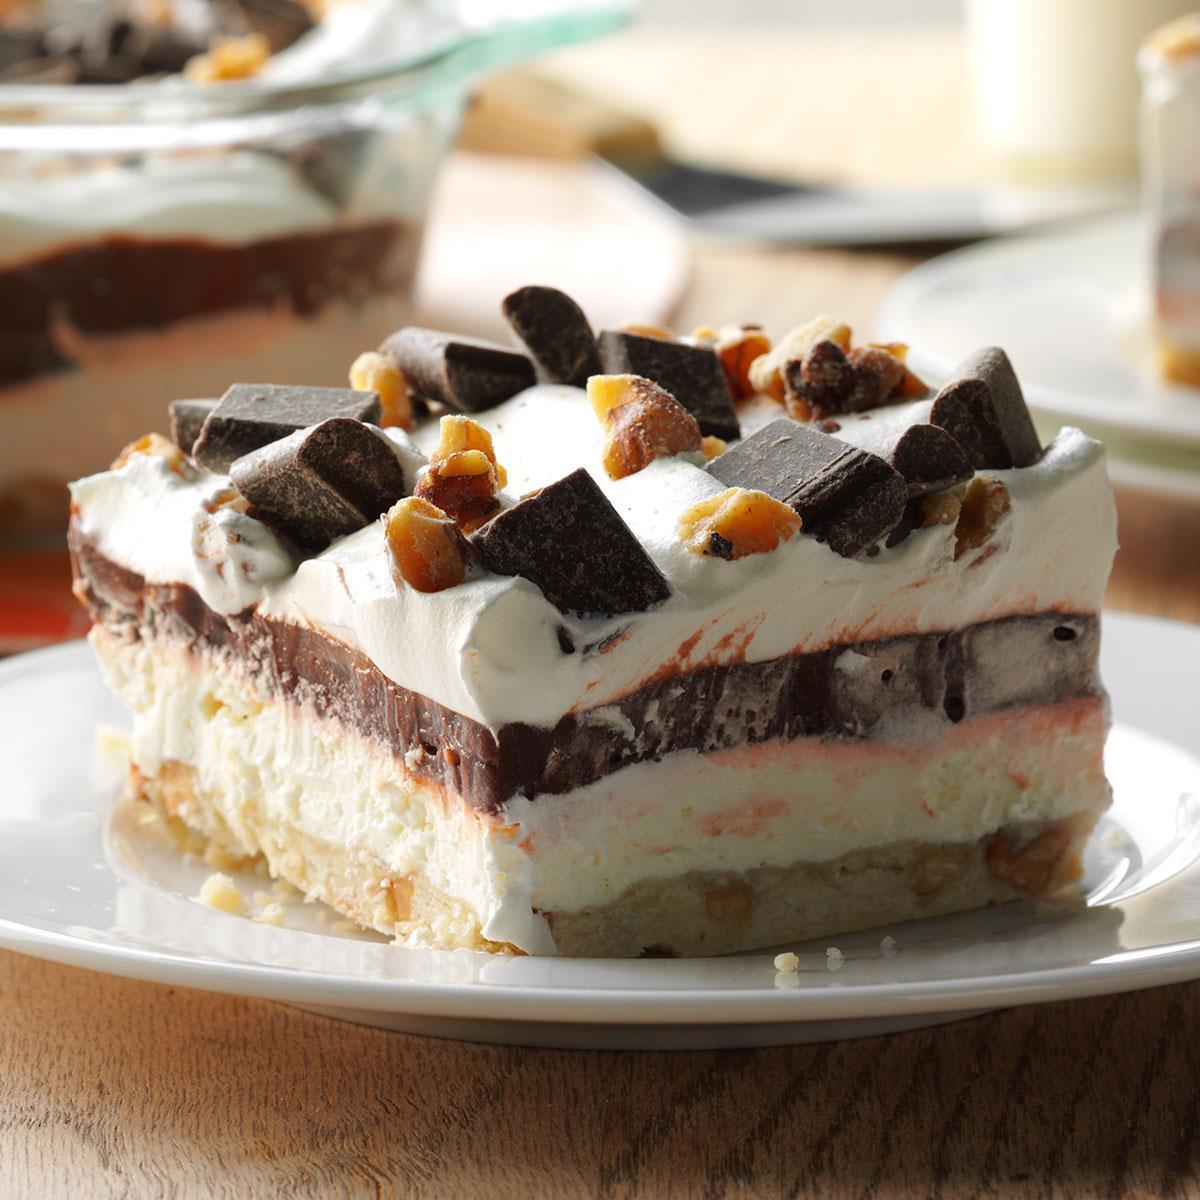 Simple Chocolate Dessert  Easy Four Layer Chocolate Dessert Recipe